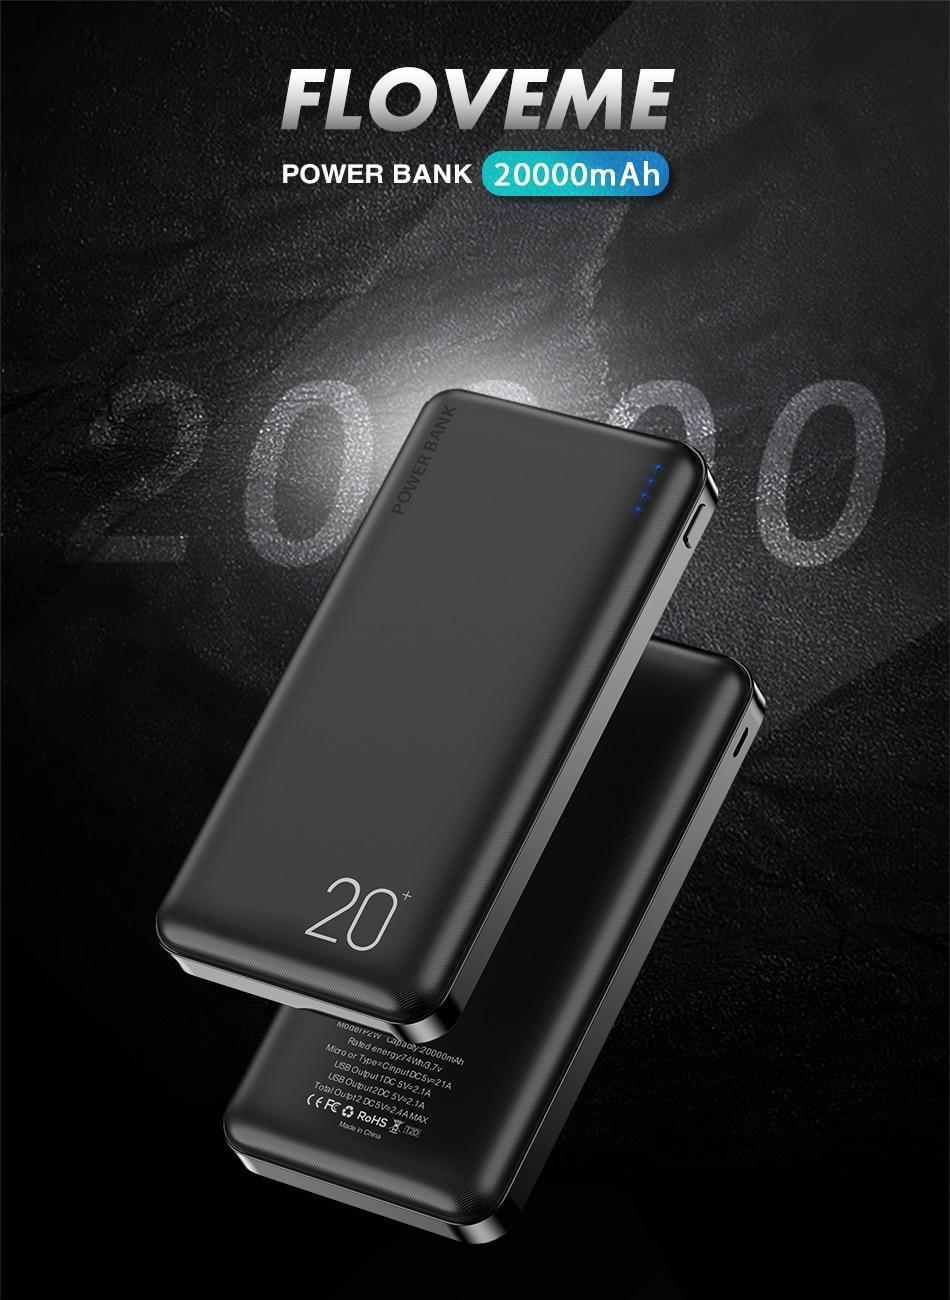 FLOVEME Power Bank 20000mAh Portable Charging Poverbank Mobile Phone External Battery Charger Powerbank 000 mAh for Xiaomi Mi 1